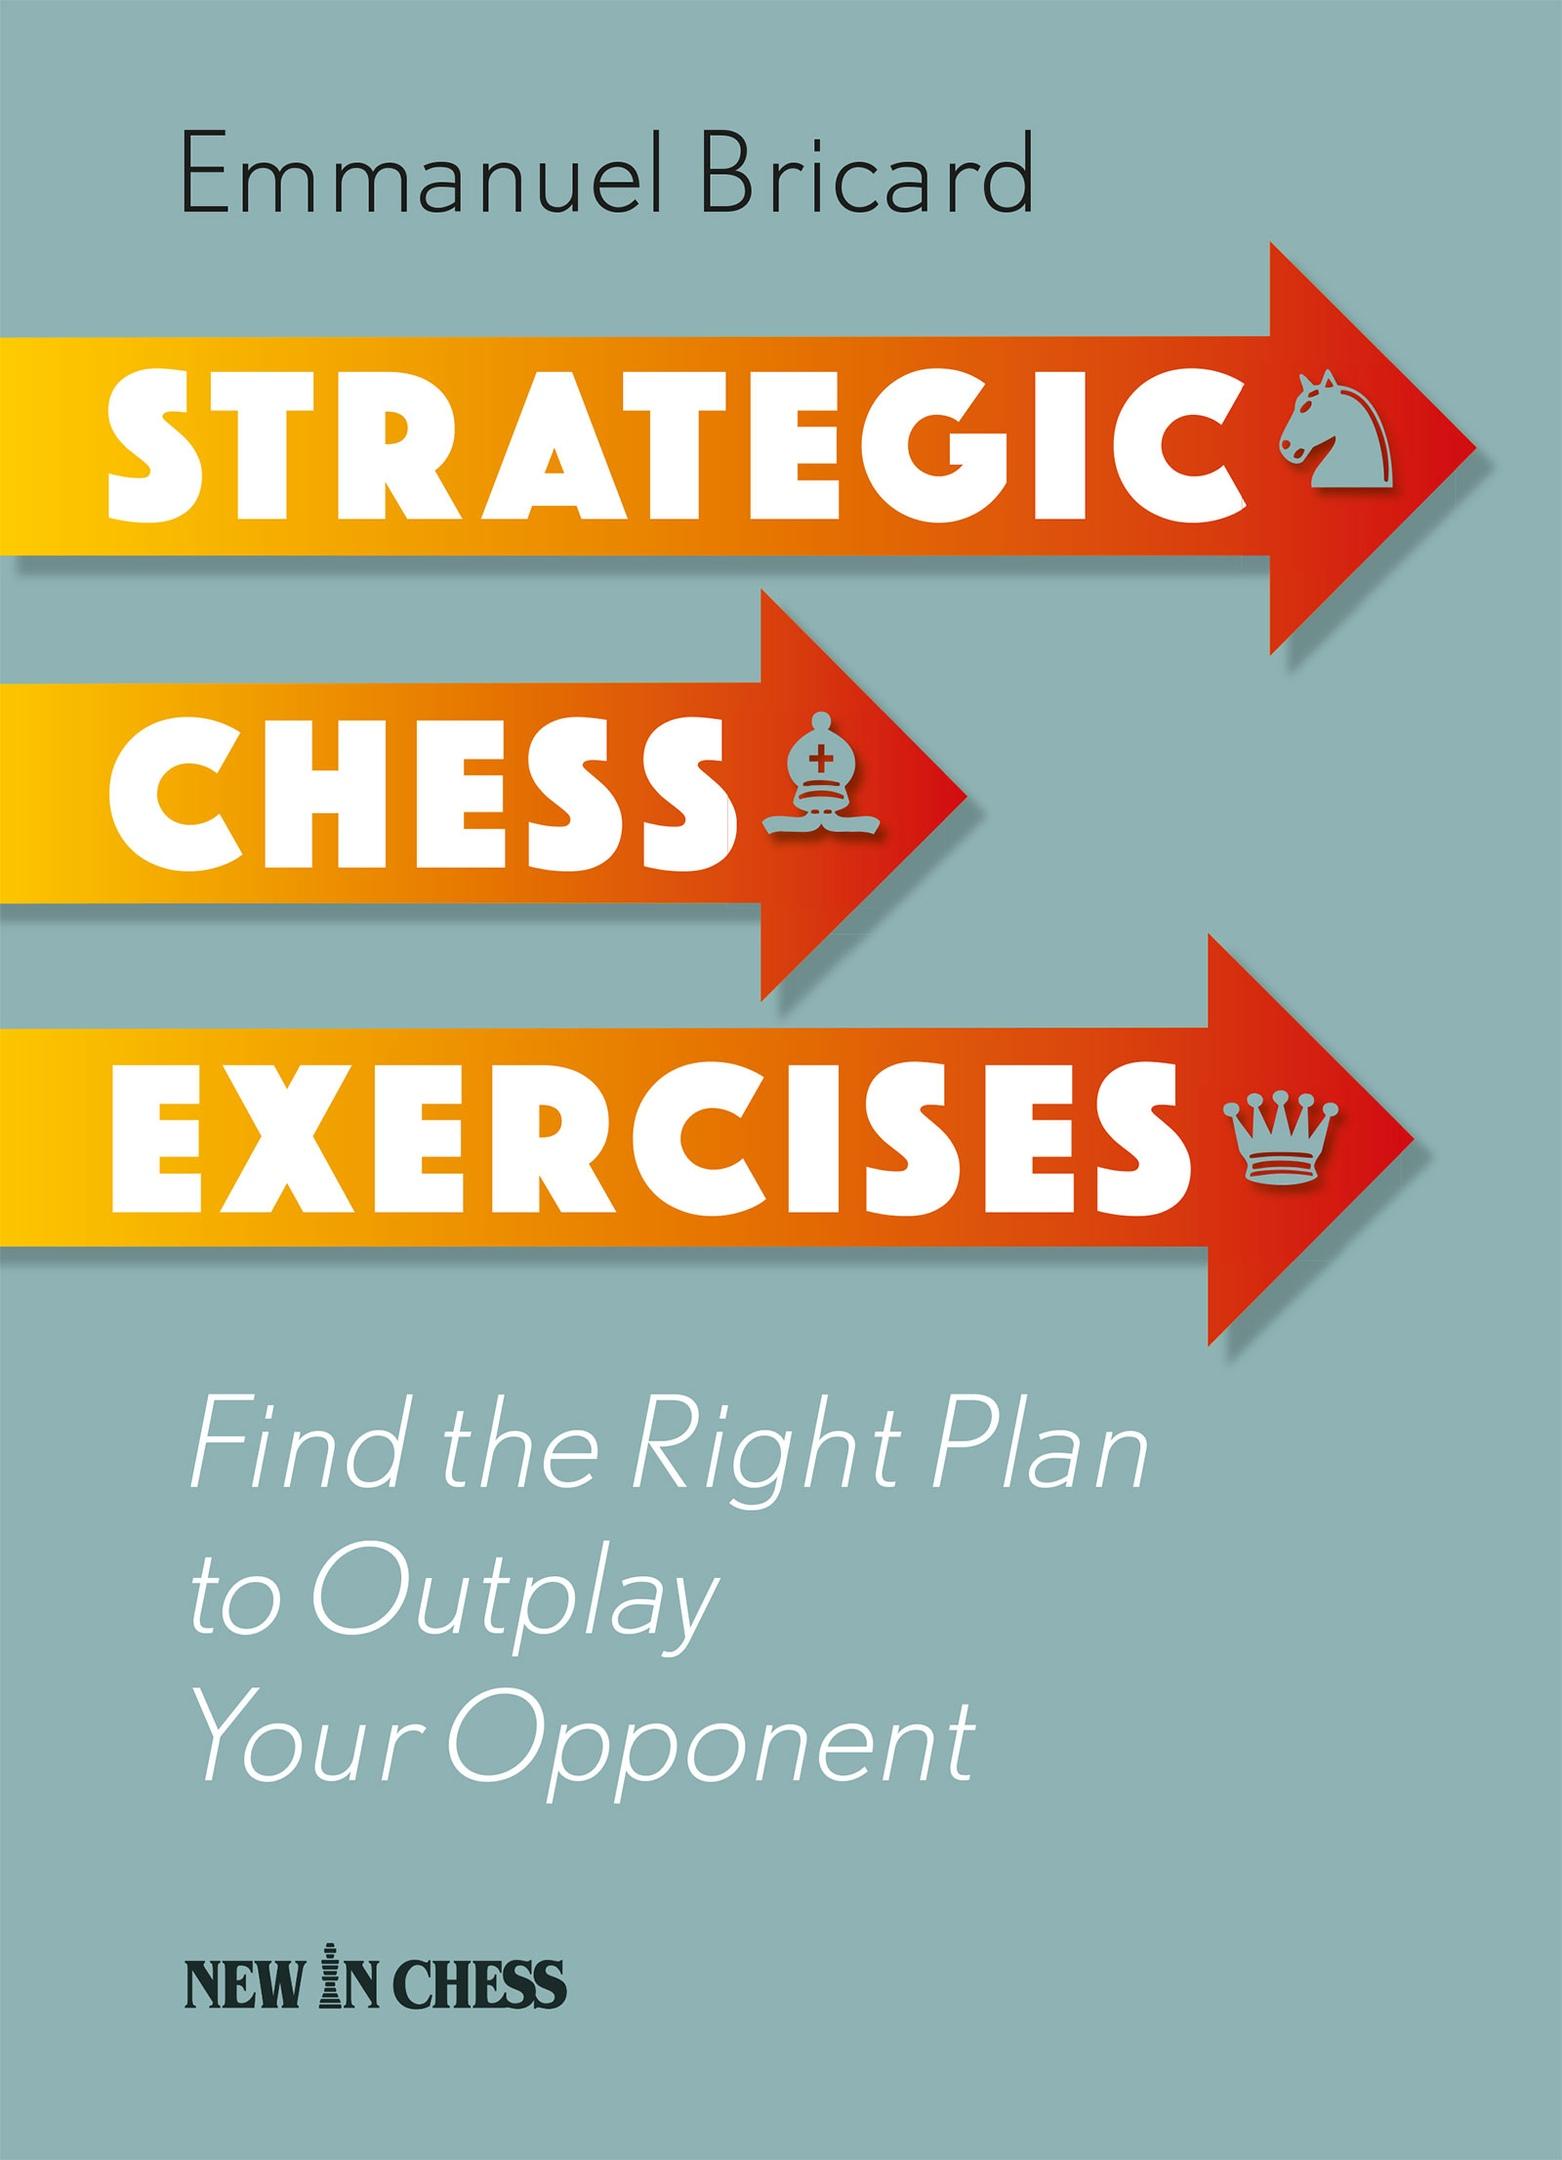 Emmanuel Bricard_Strategic Chess Excercises PDF+PGN  ZZfXiPpyTvM